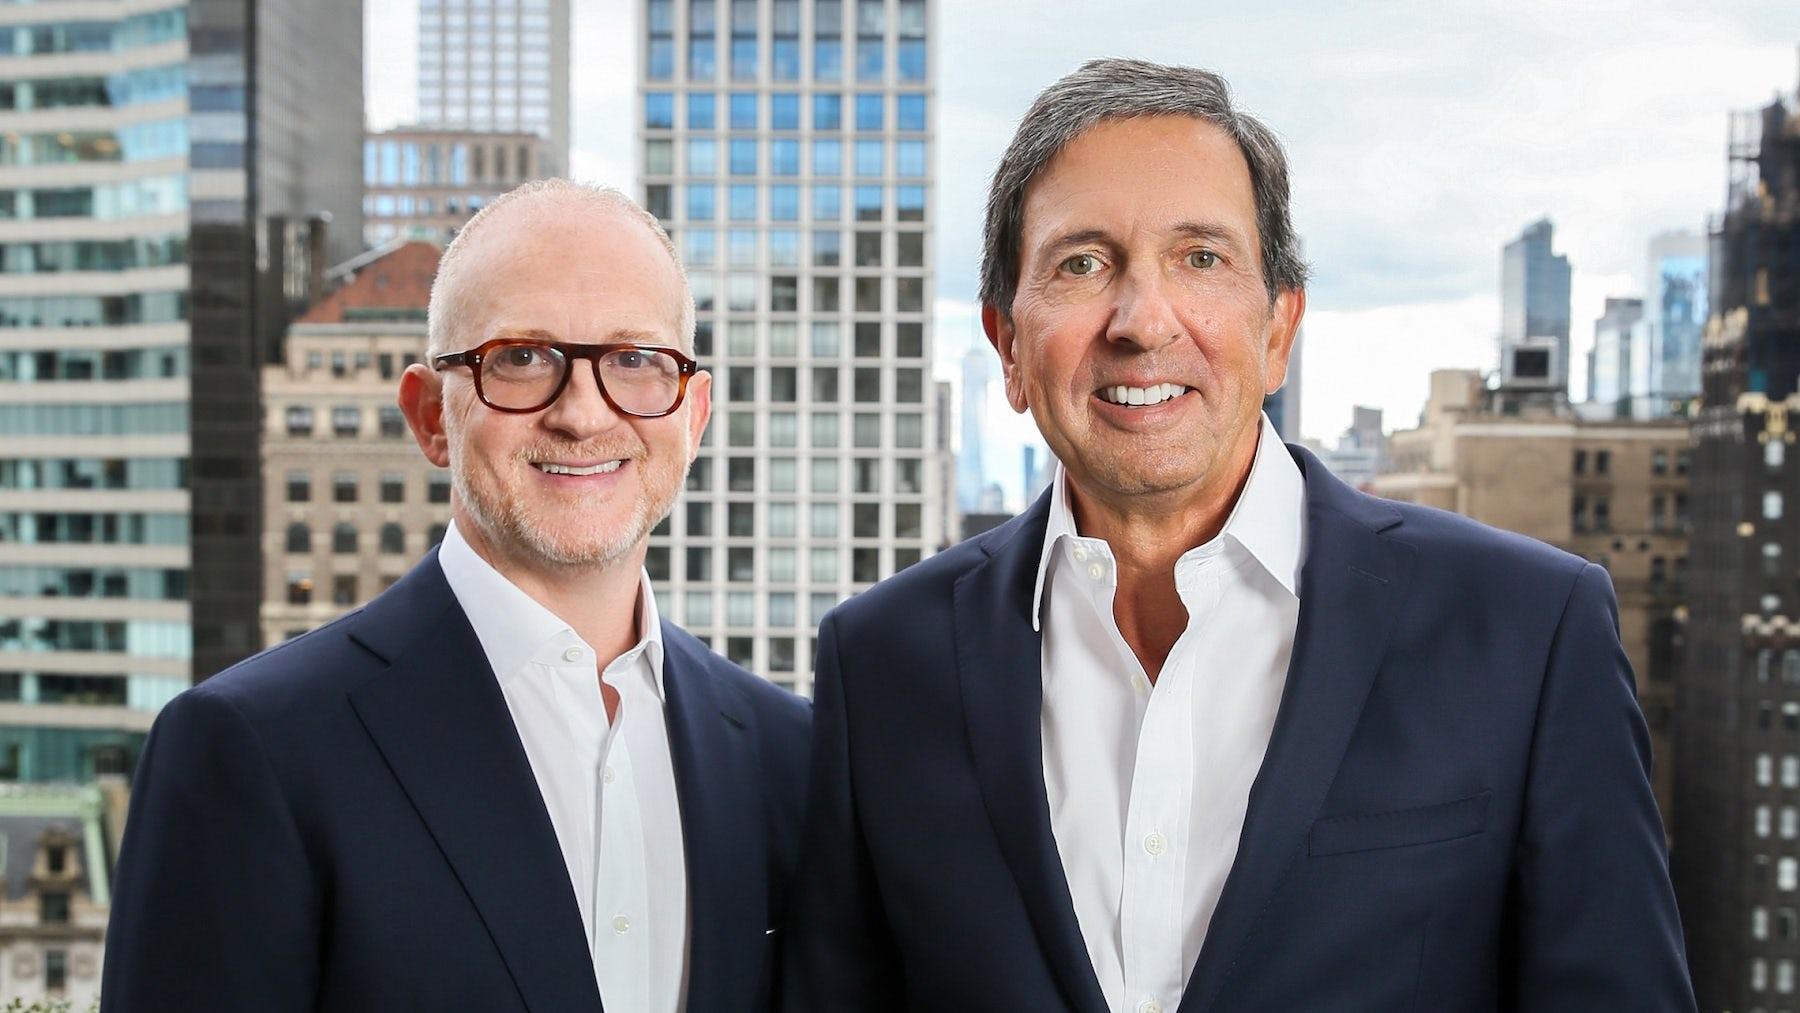 Next year, former Coach chief Joshua Schulman will take the helm of the Michael Kors parent company Capri. Courtesy.